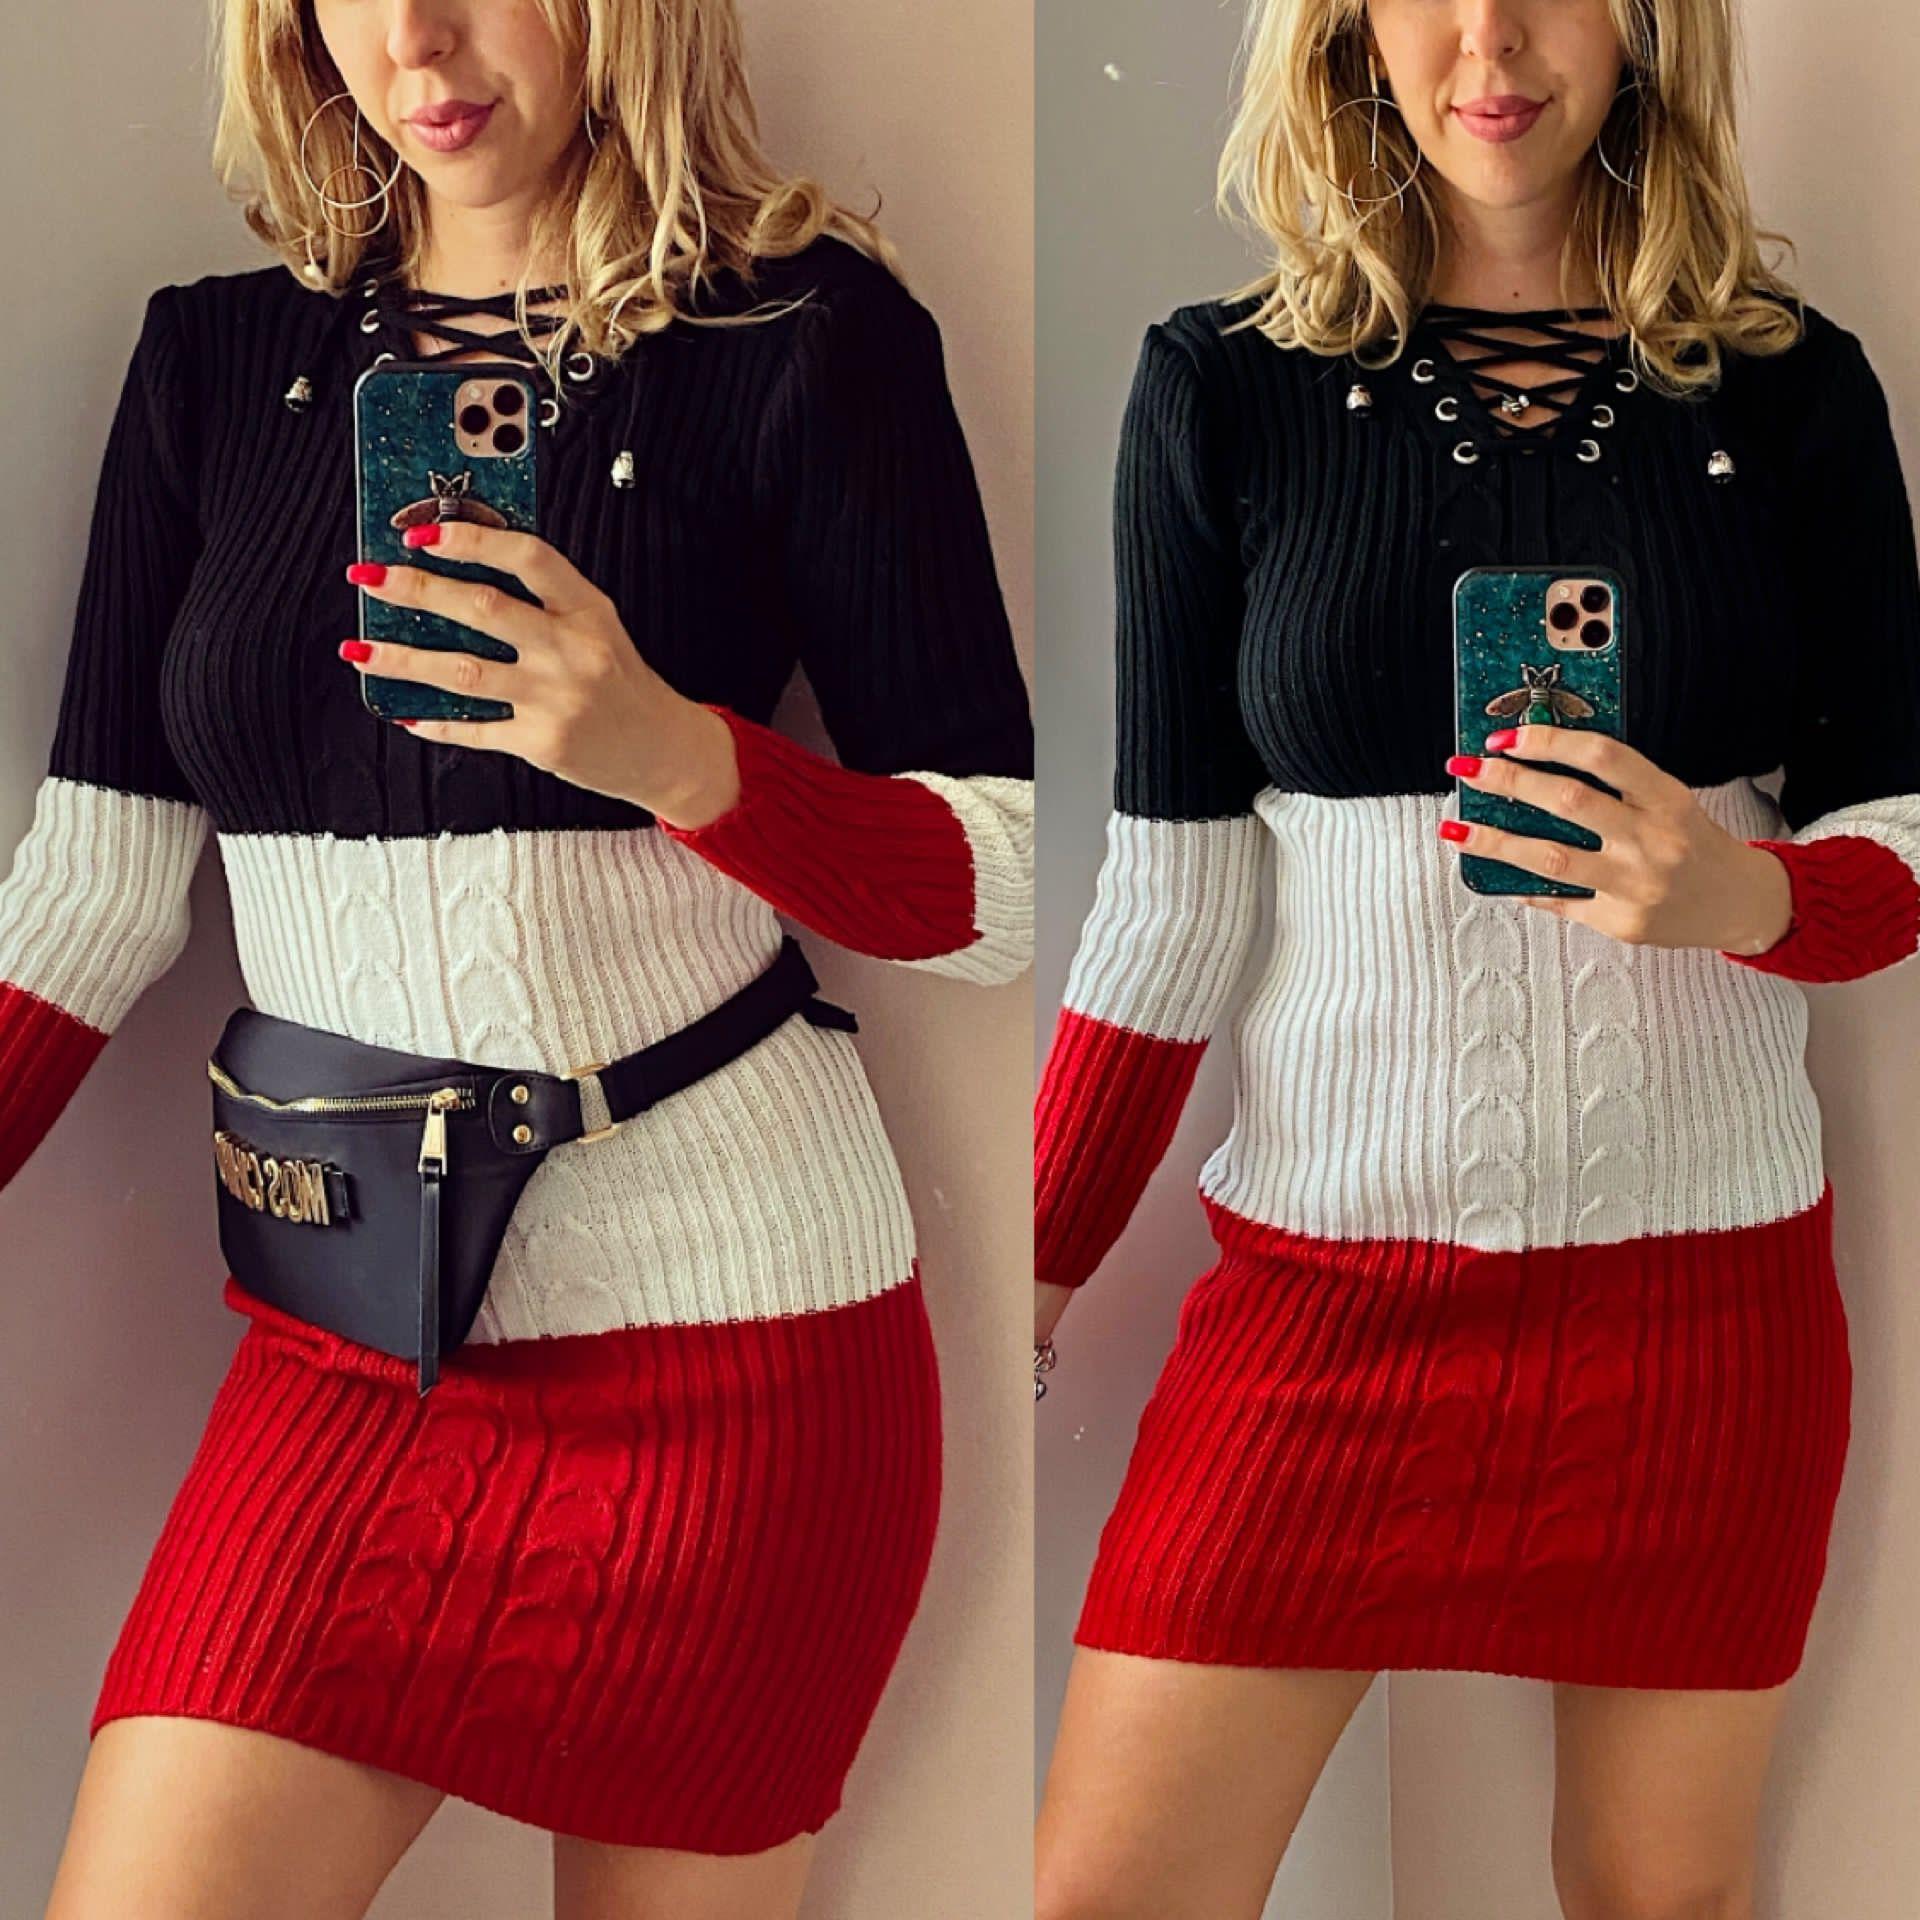 Rochie ieftina de zi din tricot neagra cu snur la gat si imprimeu 3 culori